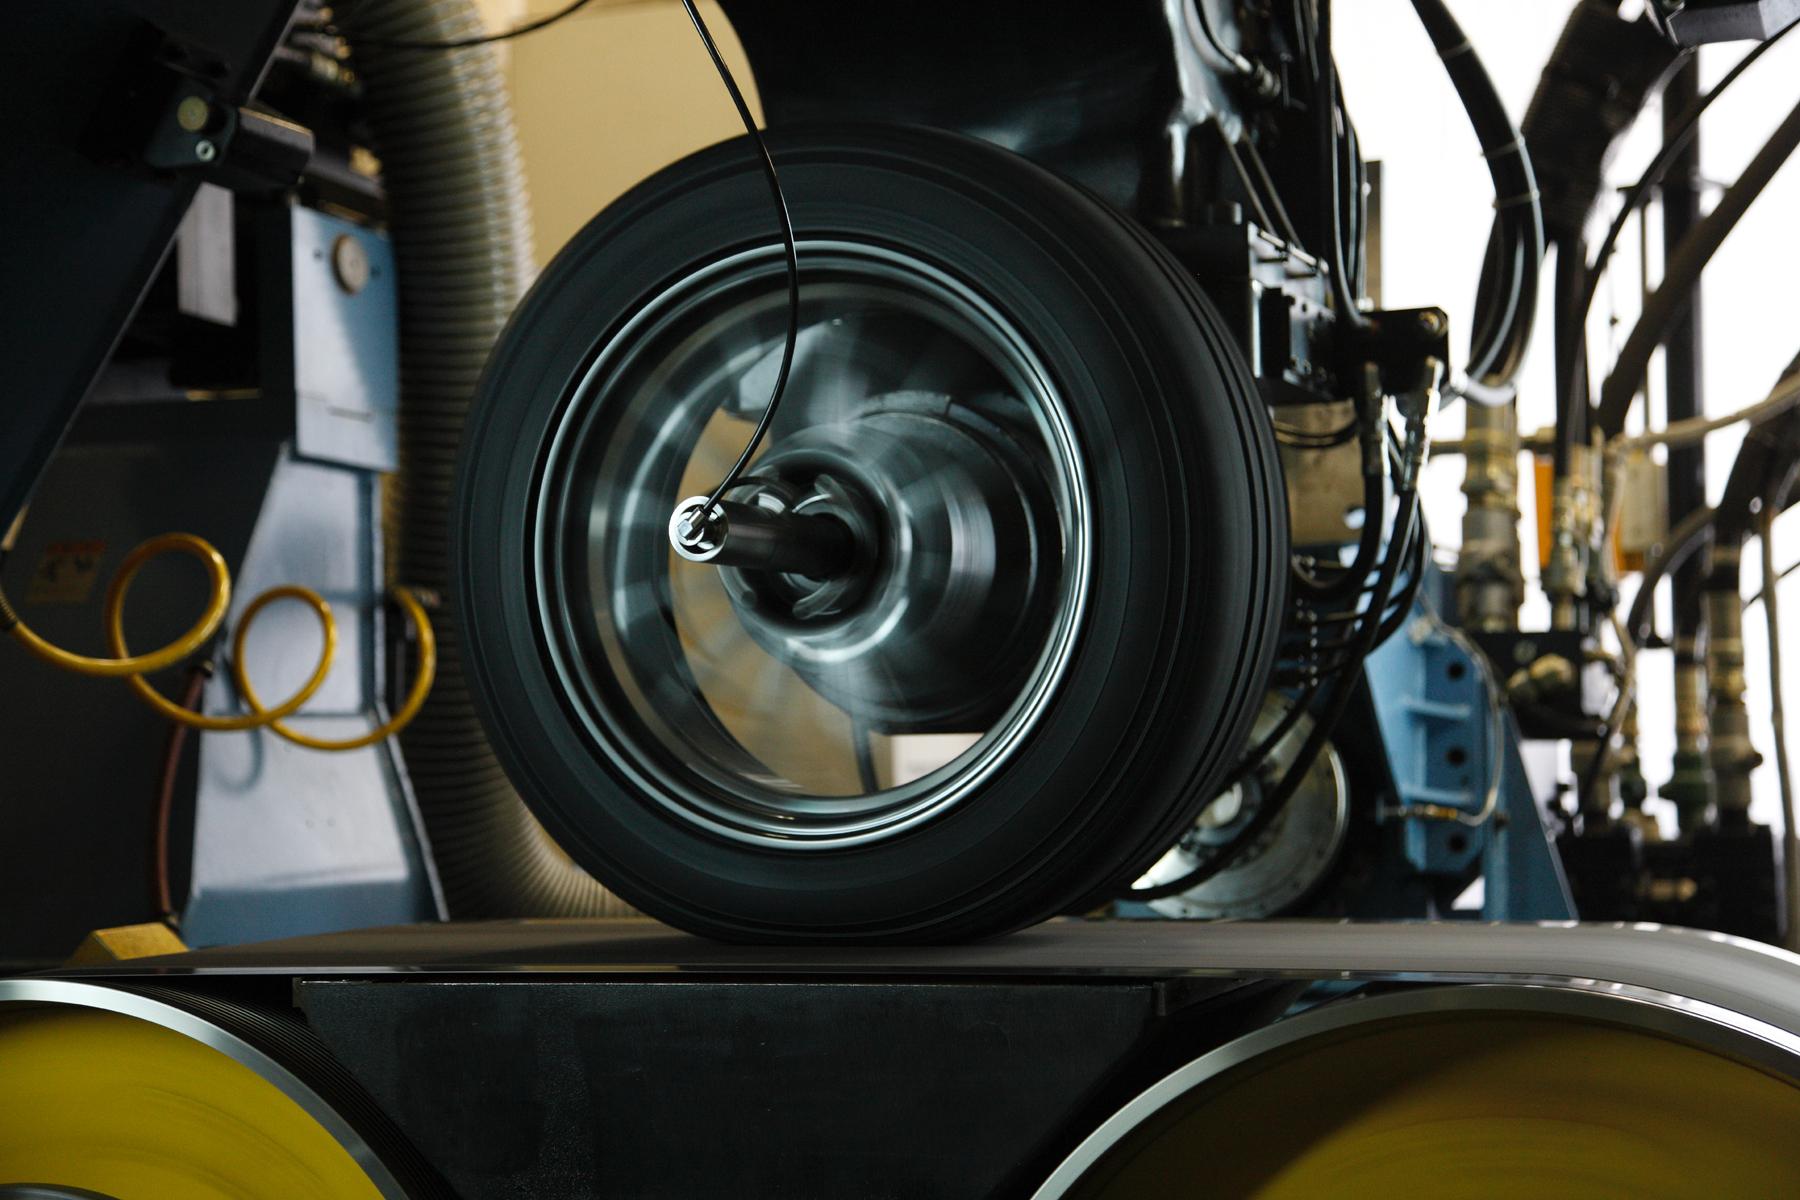 R&D Reifentest RADIC